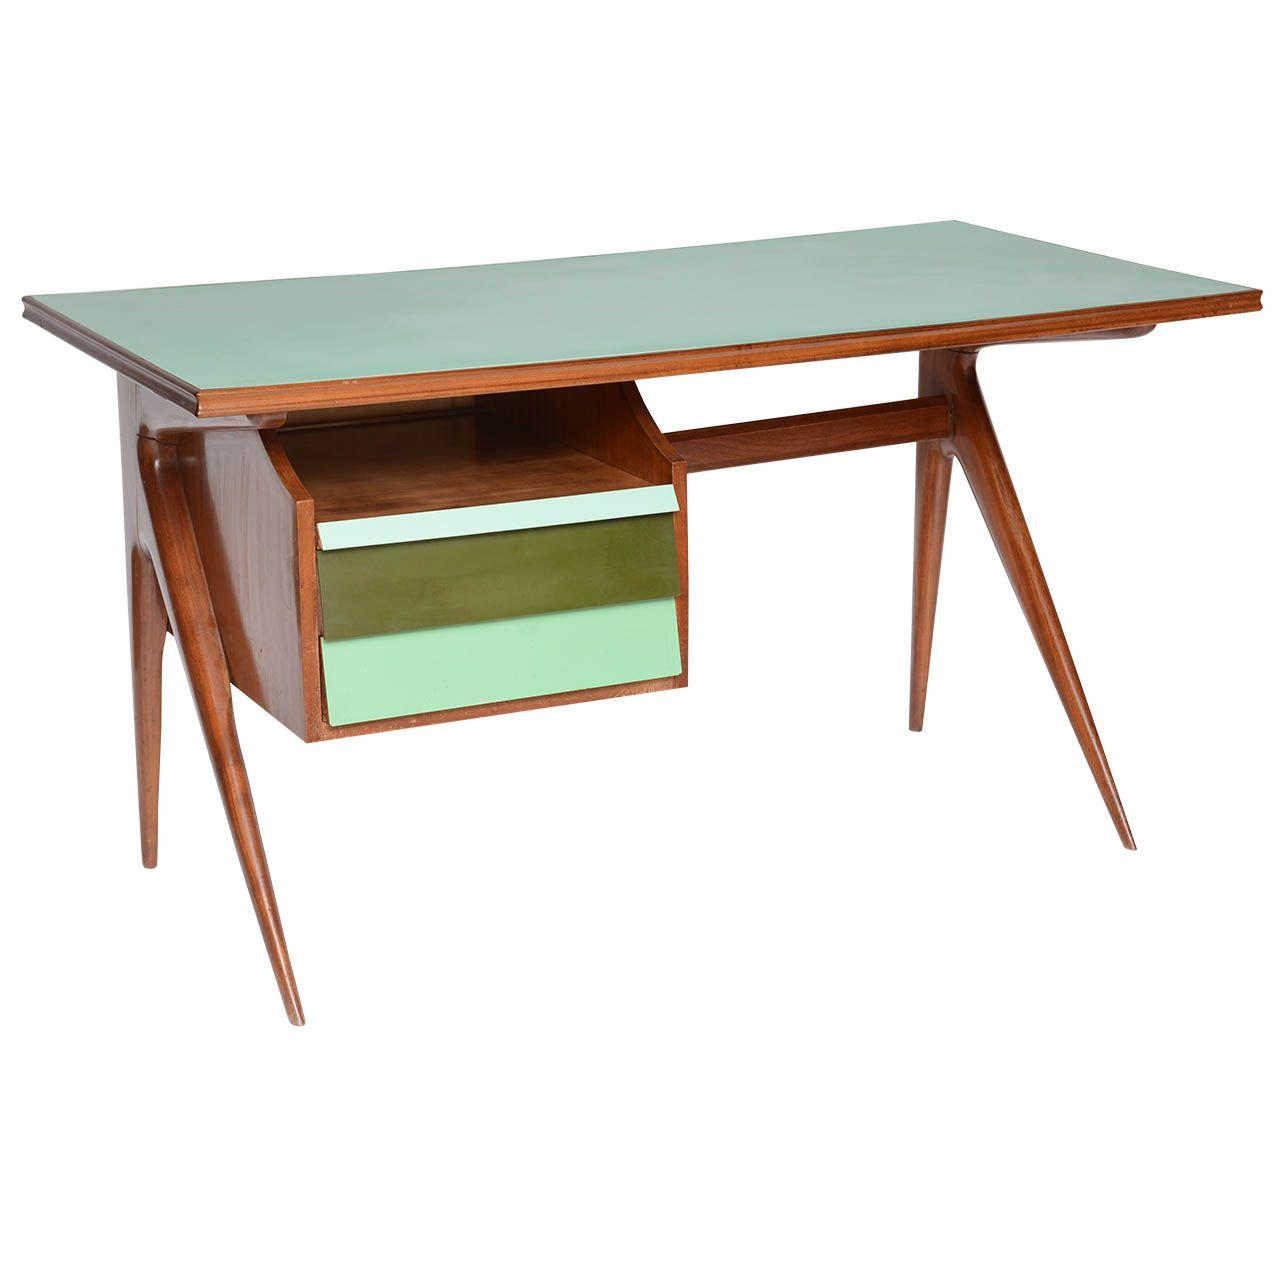 Italian Mid Century Laminate Writing Desk 1stdibs Com Mid Century Furniture Diy Mcm Furniture Wood Furniture Store